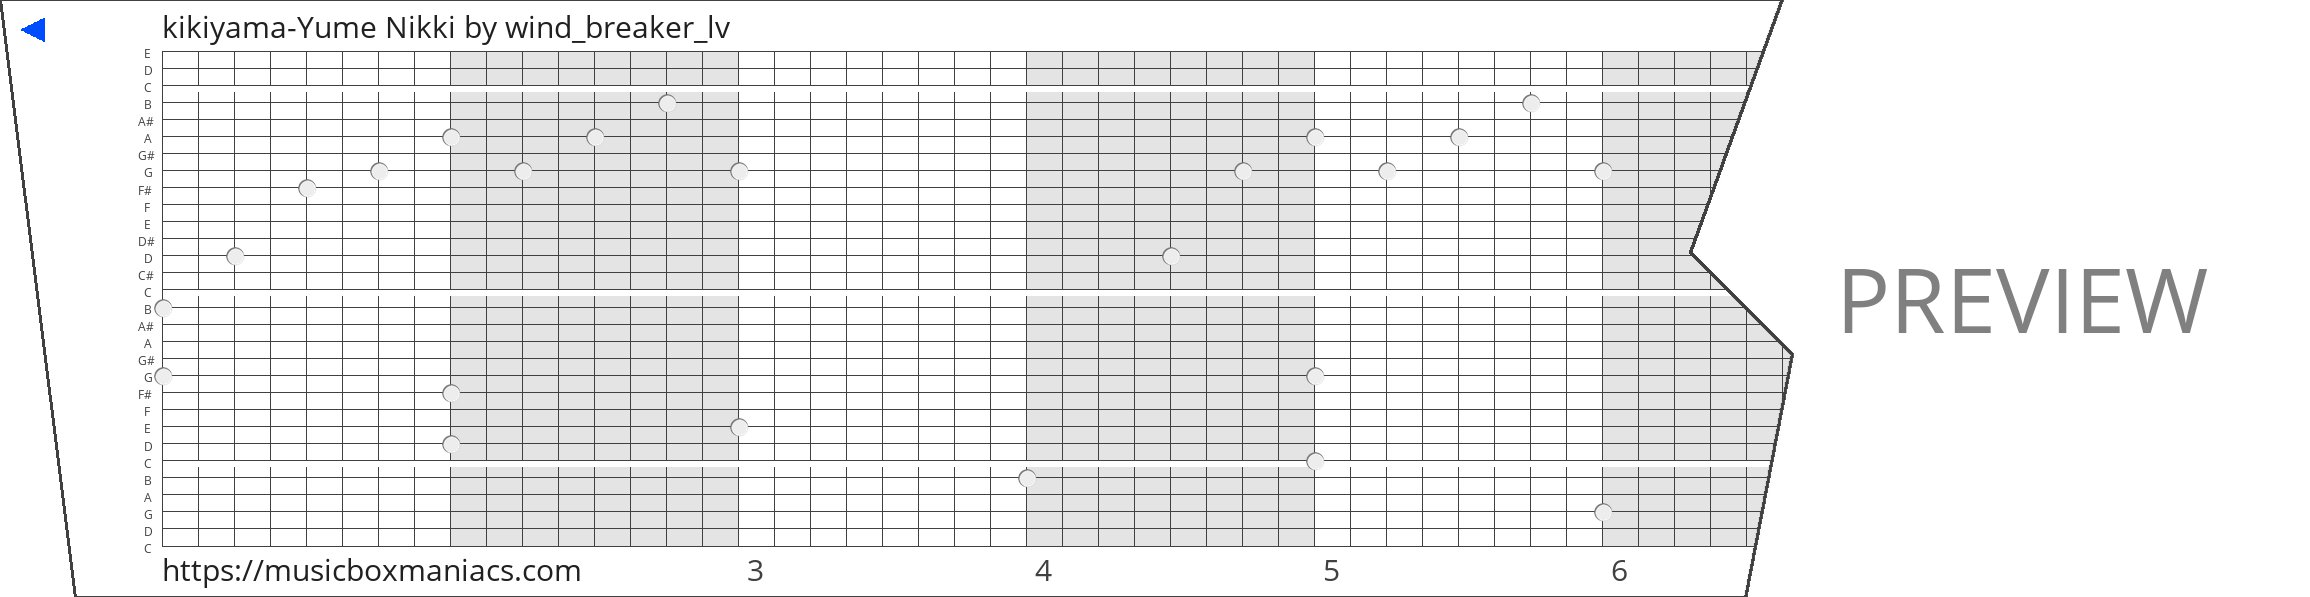 kikiyama-Yume Nikki 30 note music box paper strip